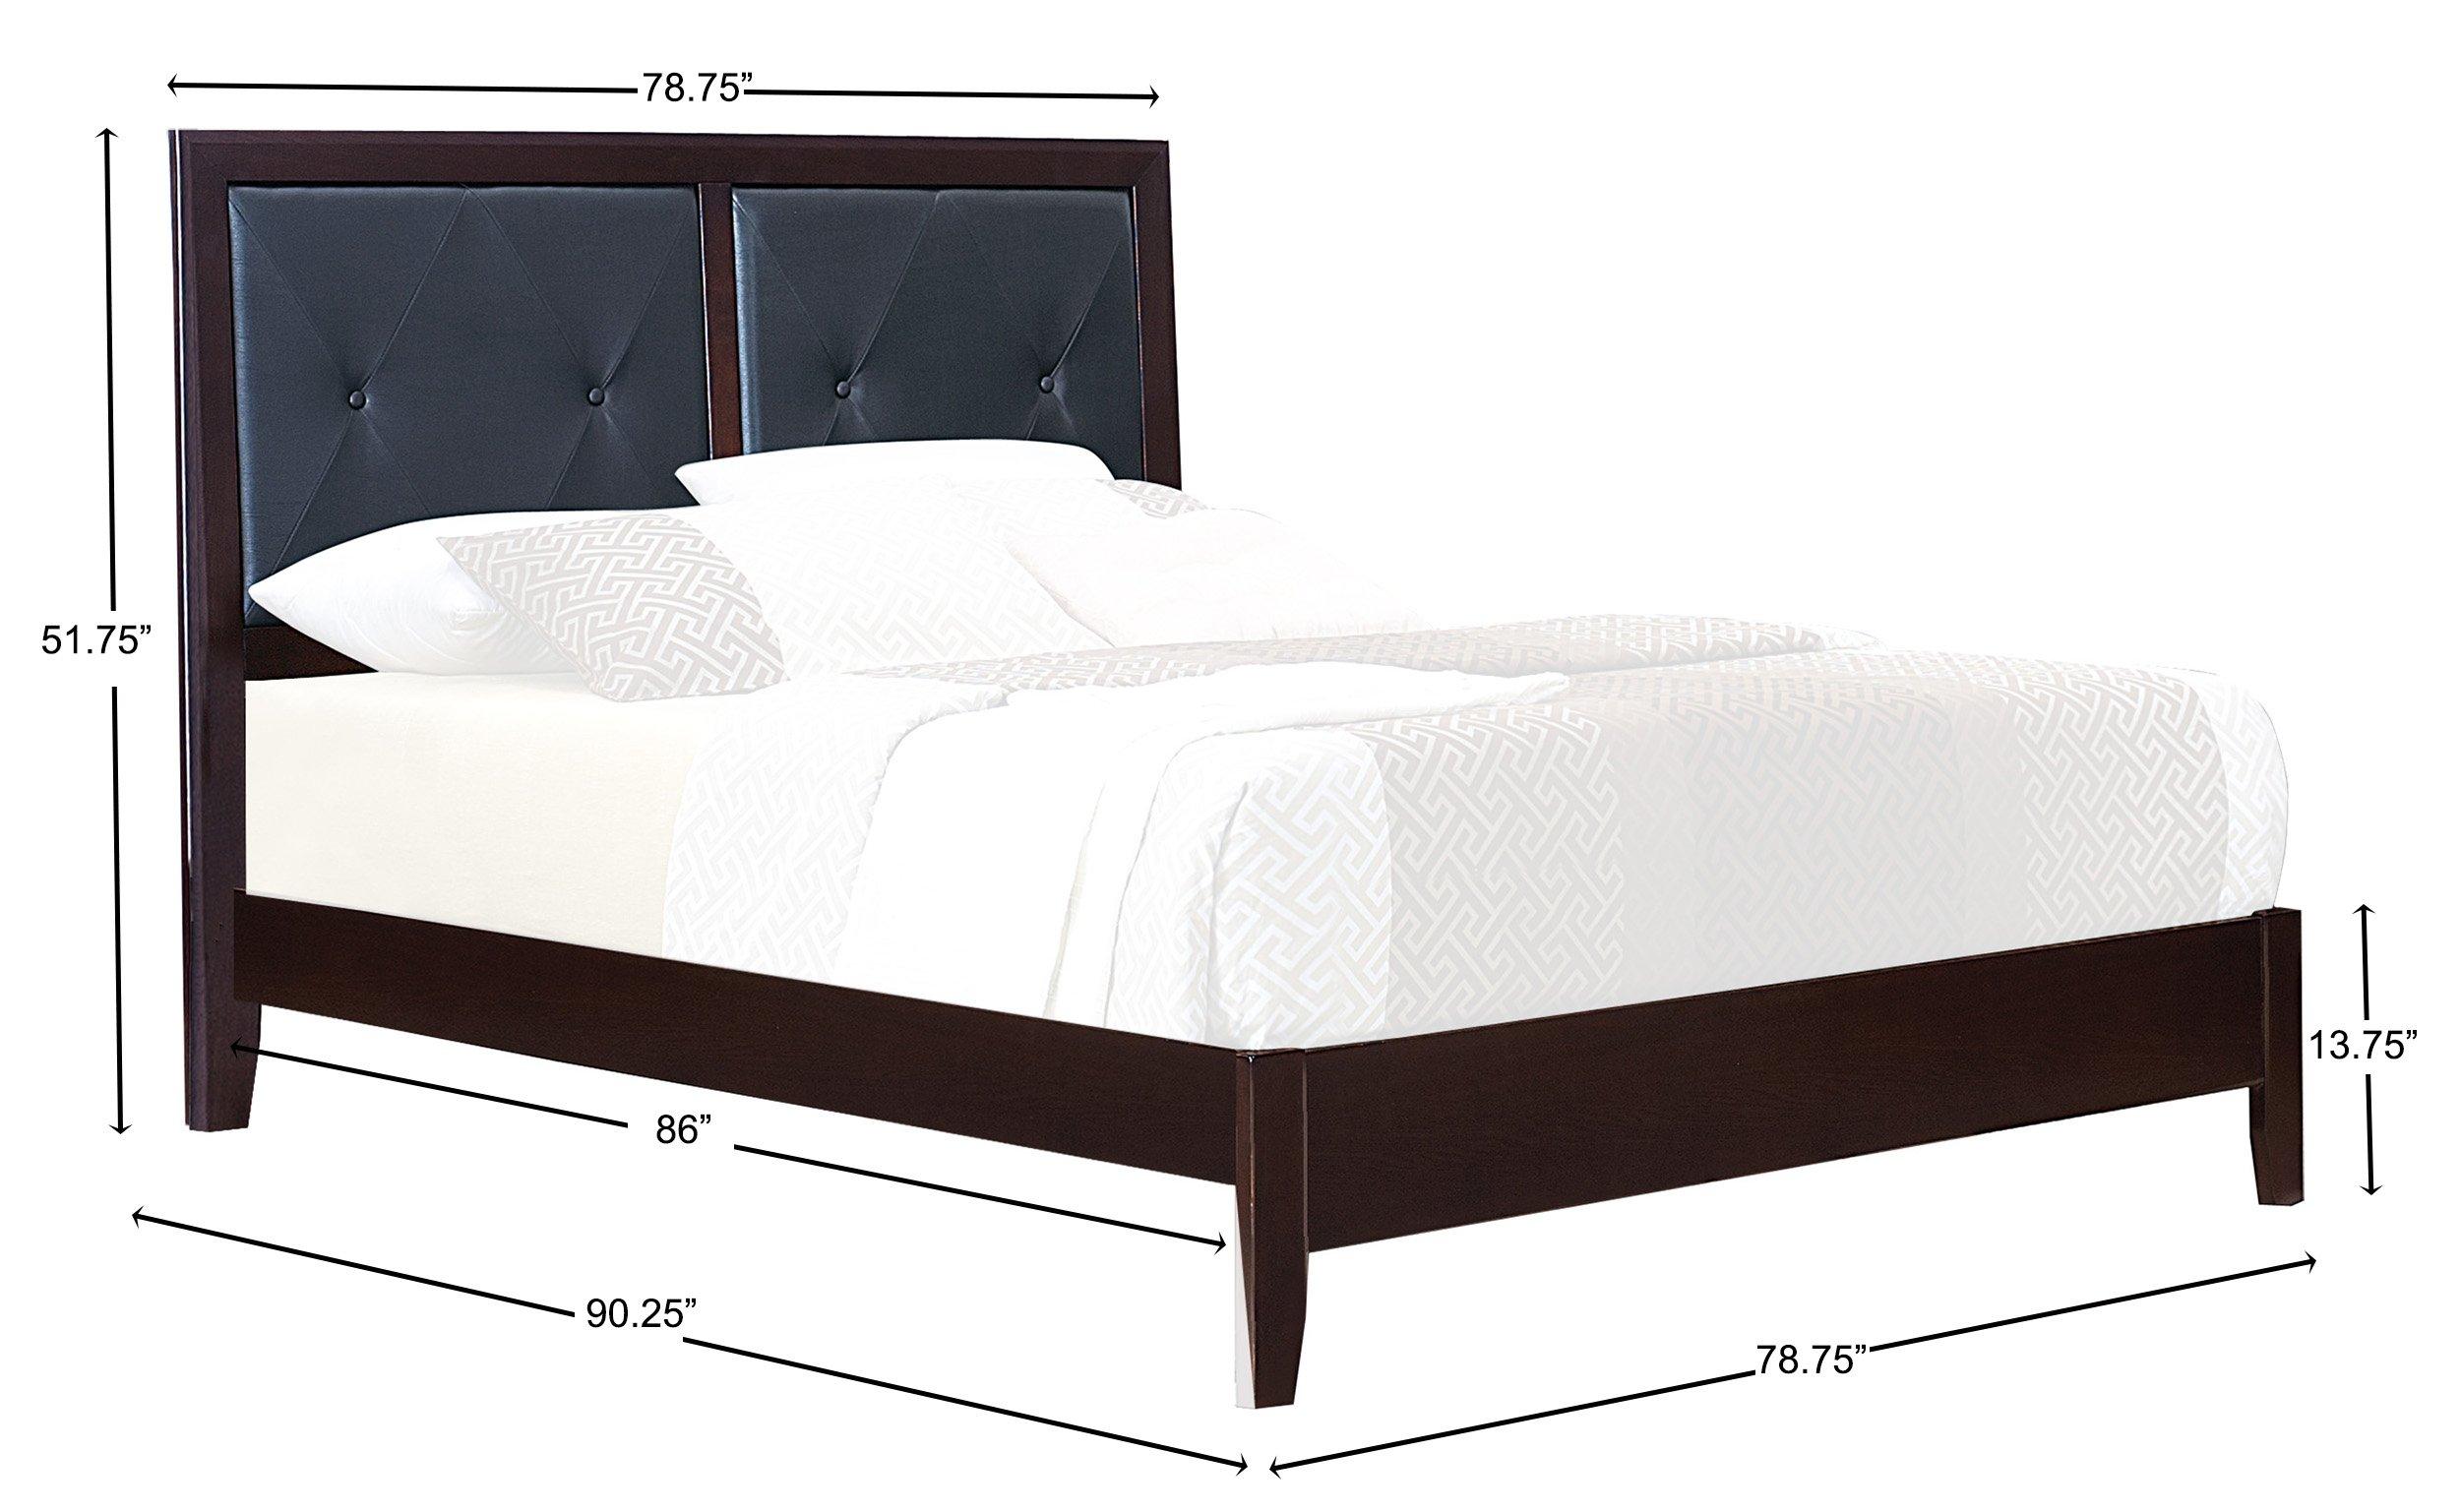 Homelegance Edina Faux Leather Upholstered Faux Leather Upholstered California King Bed, Dark Cherry